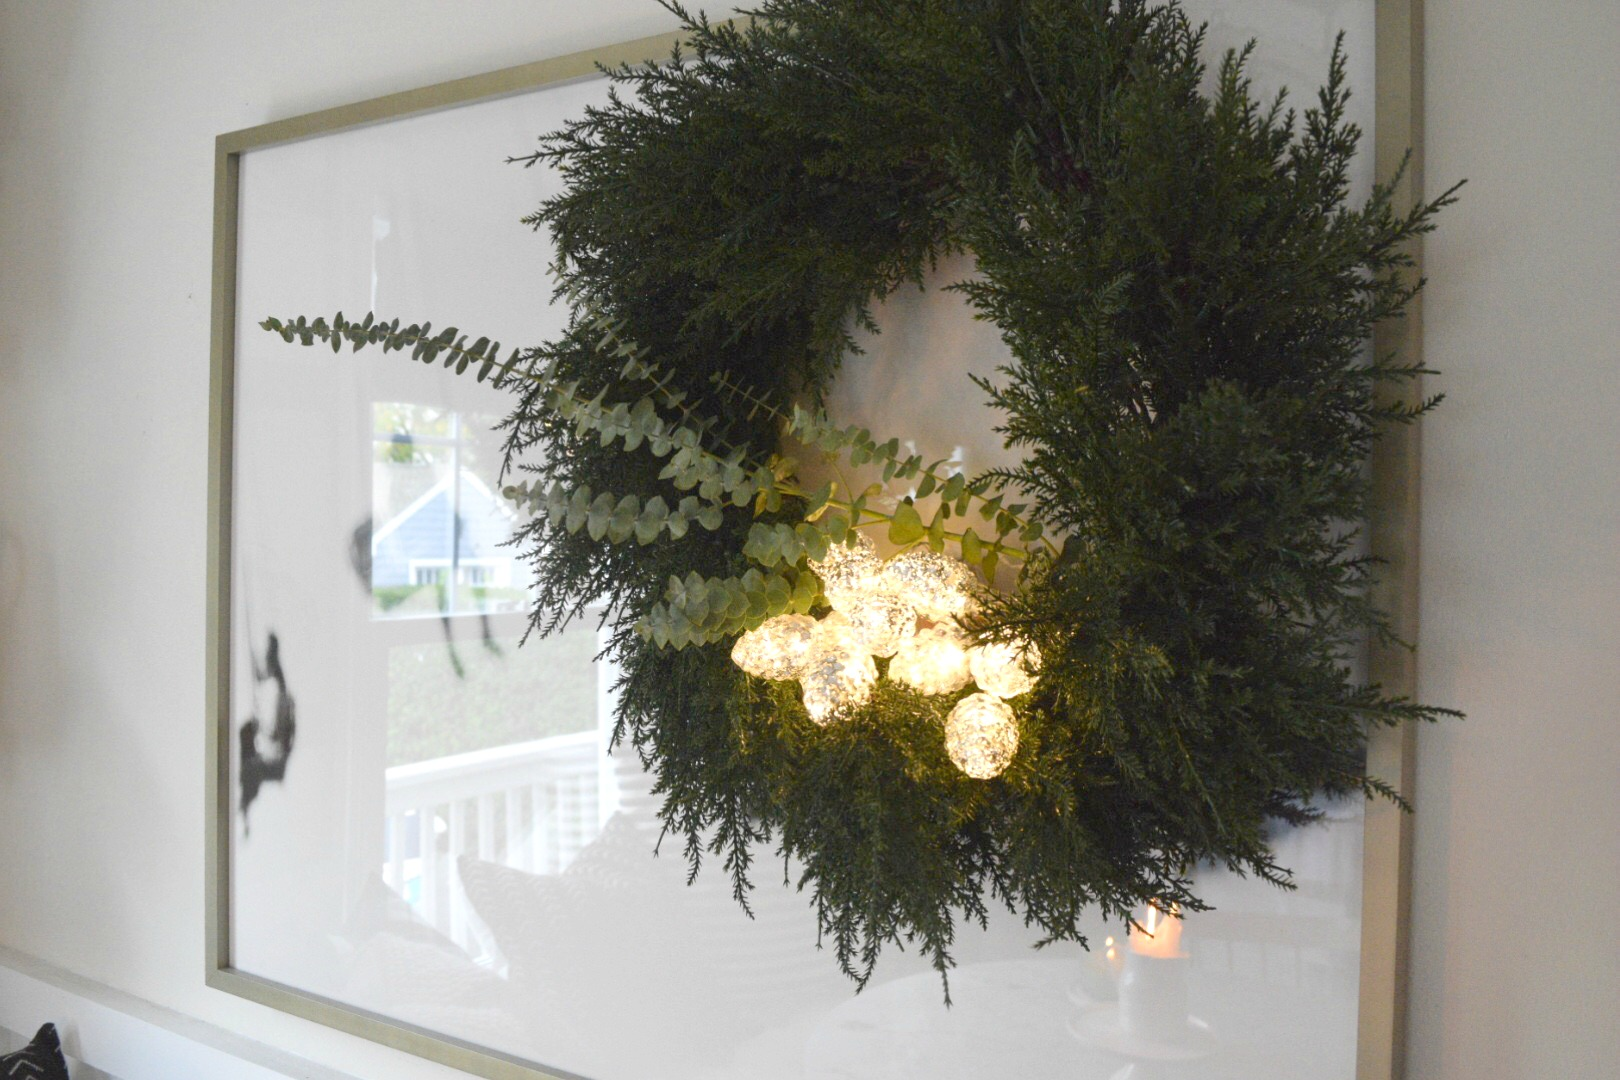 Christmas Decor- Christmas Garland above Window- Small Kitchen